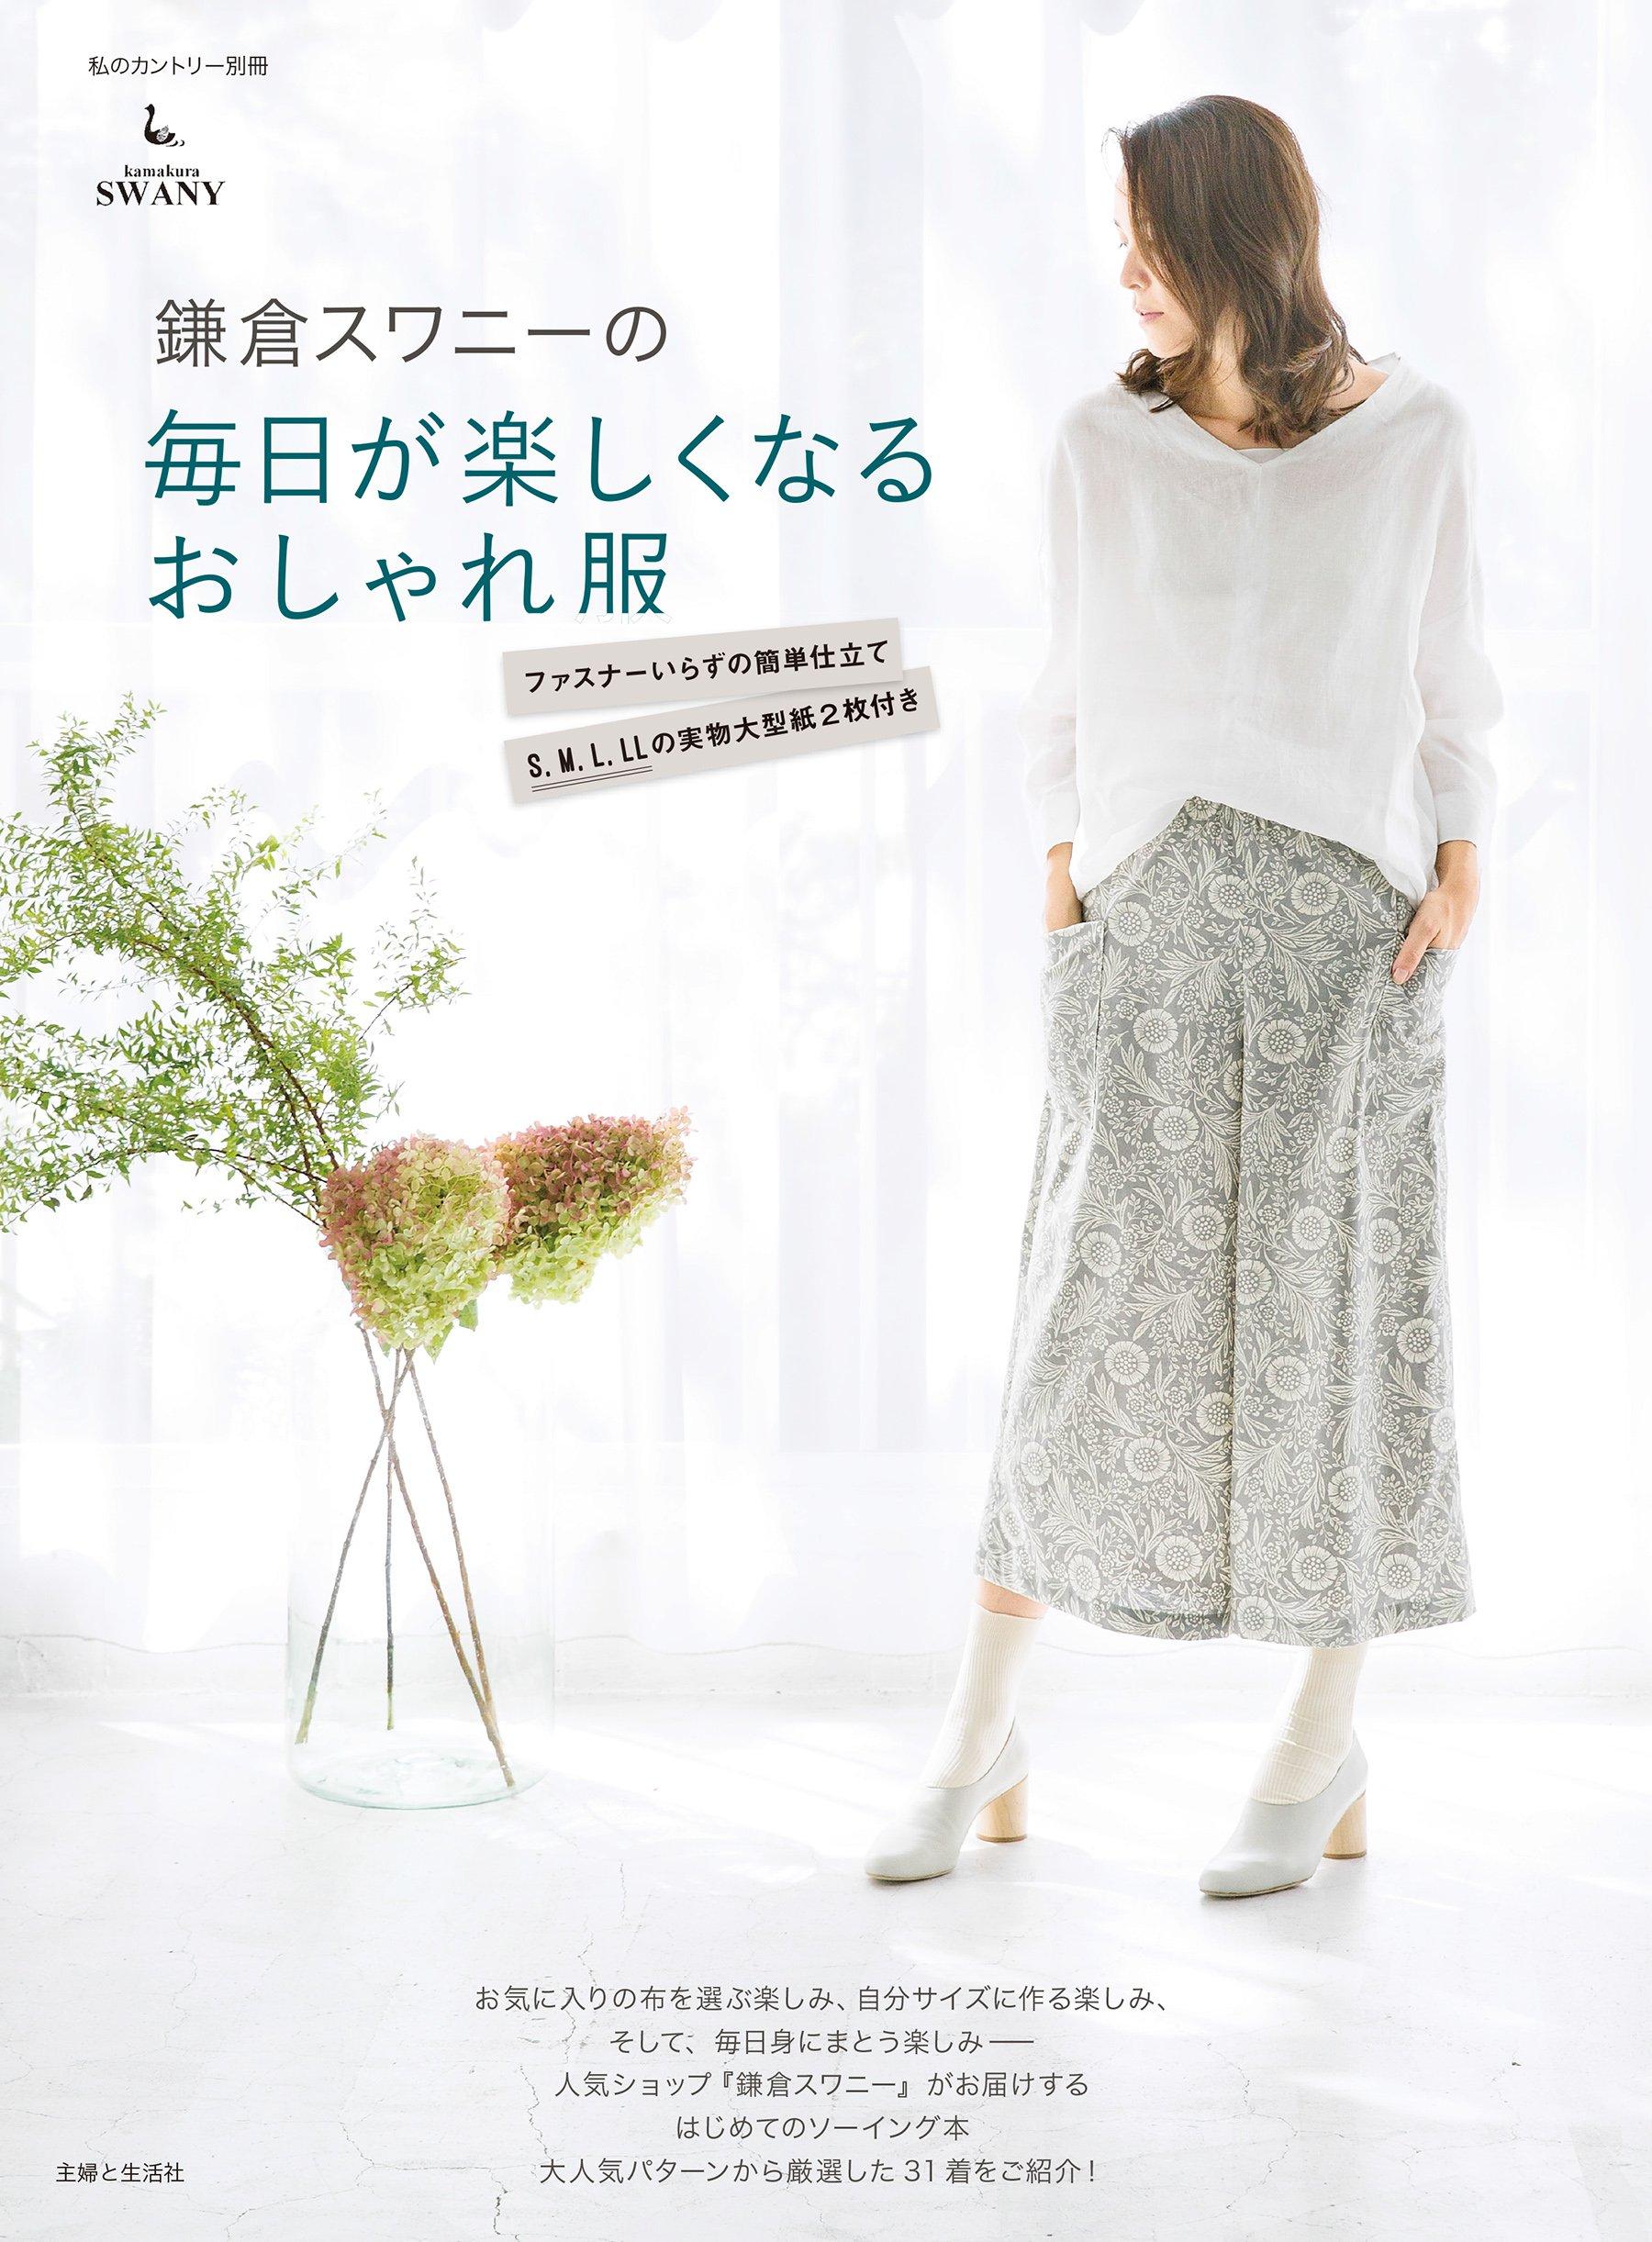 Fashionable clothes every day is fun of Kamakura Suwanee